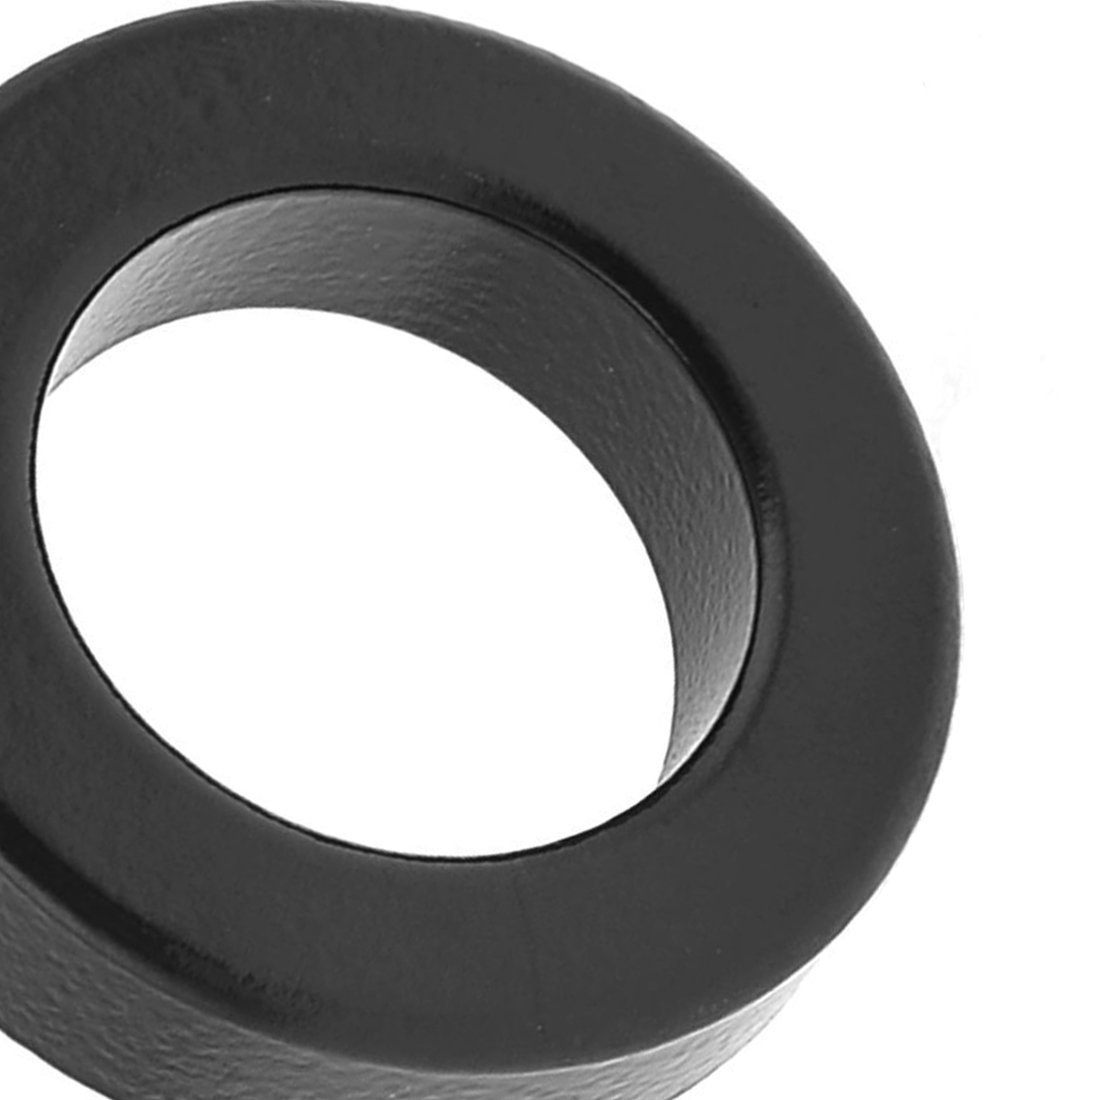 Toroide nucleo de ferrita - TOOGOO(R) Toroide nucleo de ferrita de AS225-125A piezas de transformador de bobina de atragantamiento negro: Amazon.es: ...